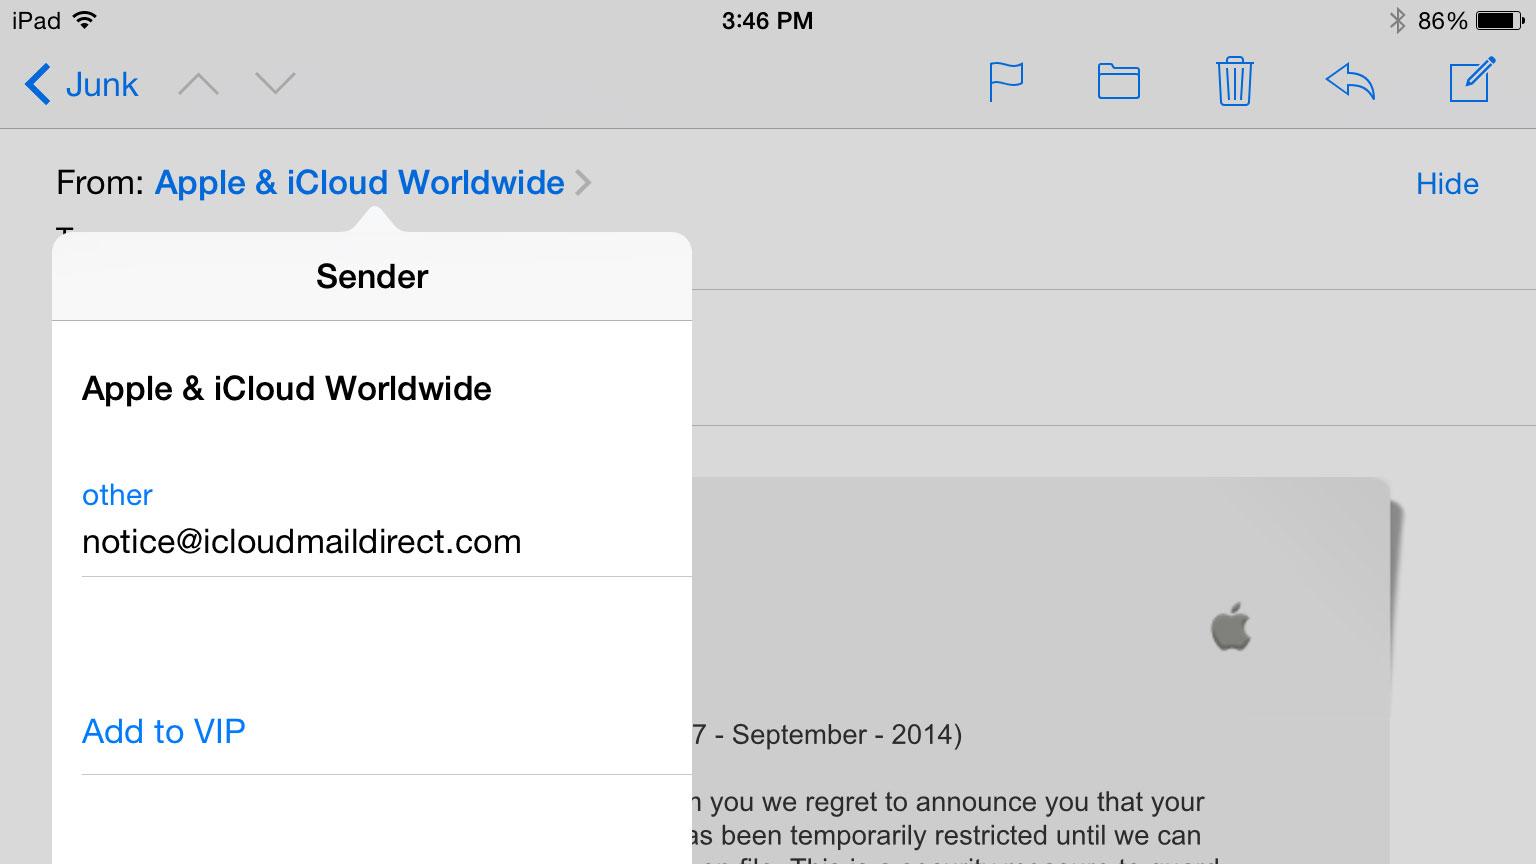 Phising-Email-Apple-iCloud-from-noticeaticloudmaildirectdotcom